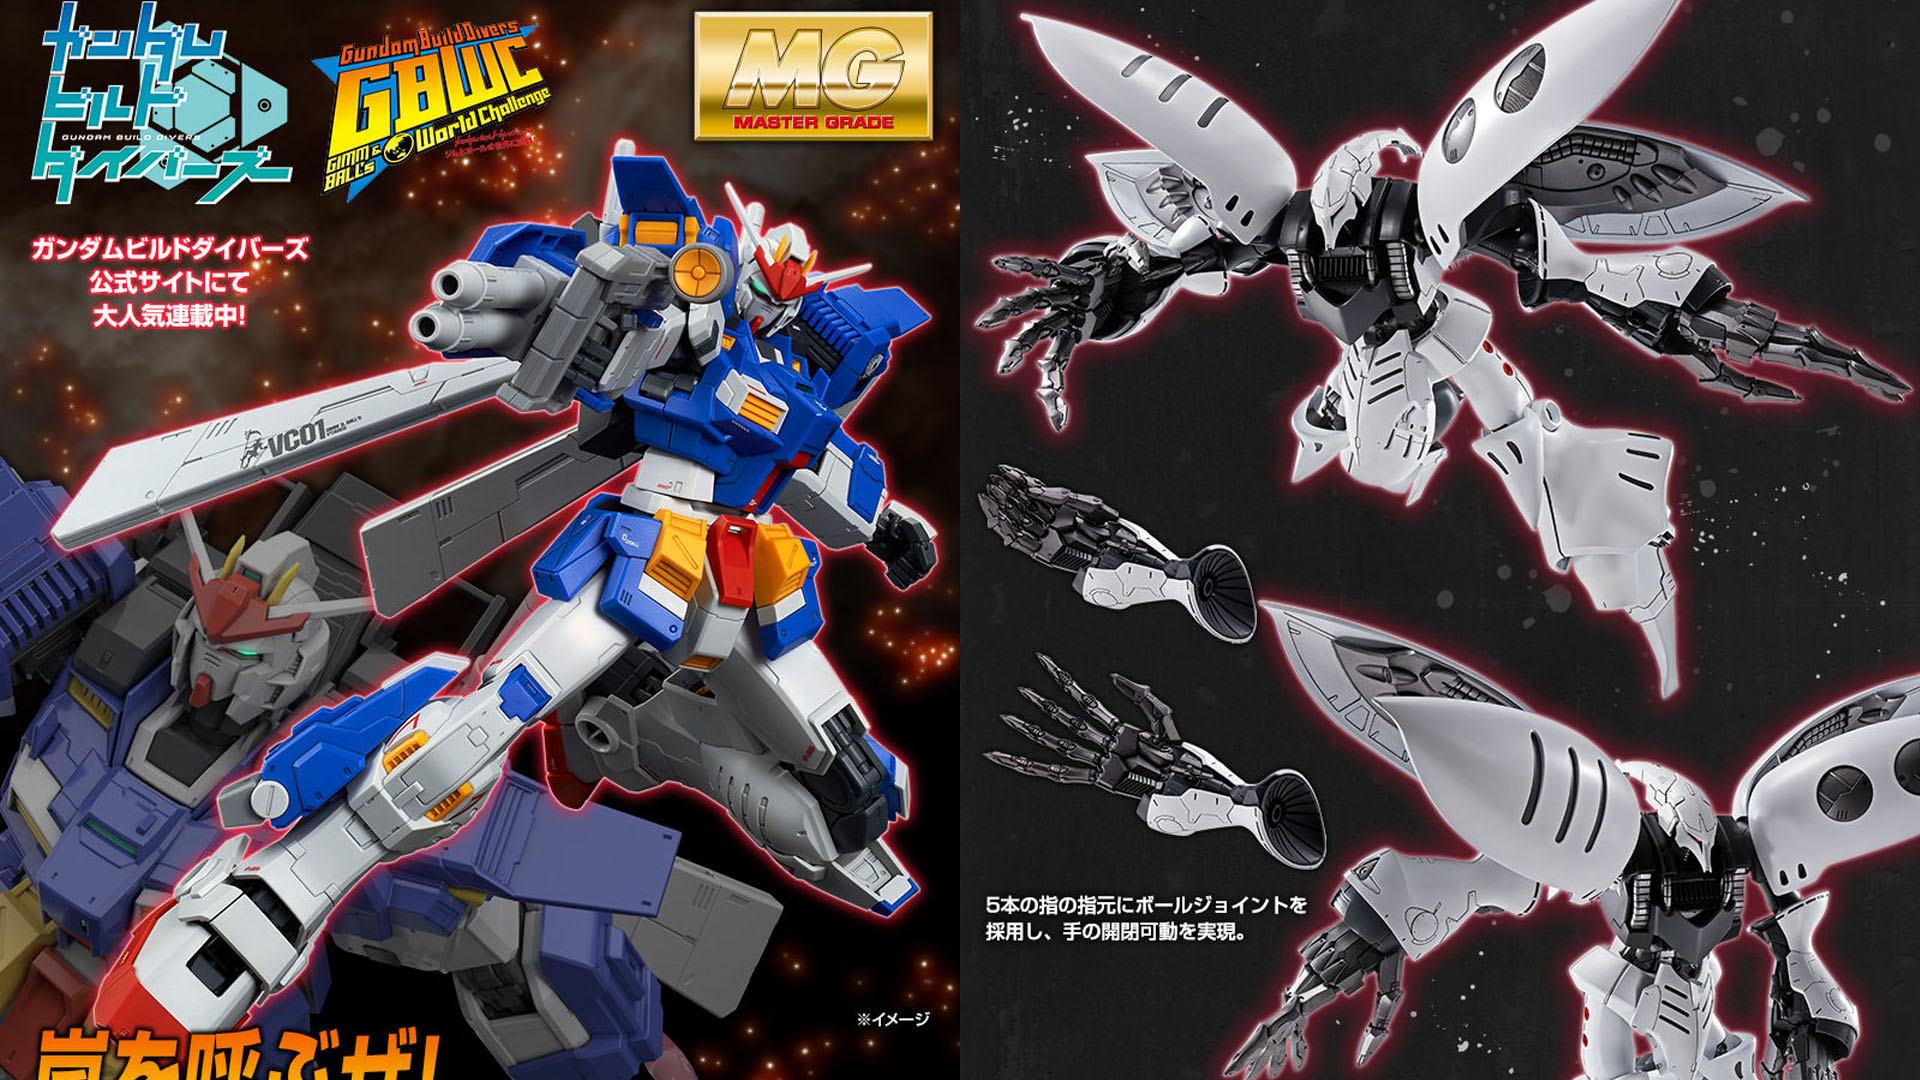 P-Bandai MG Gundam Storm Bringer et MG Qubeley Damned